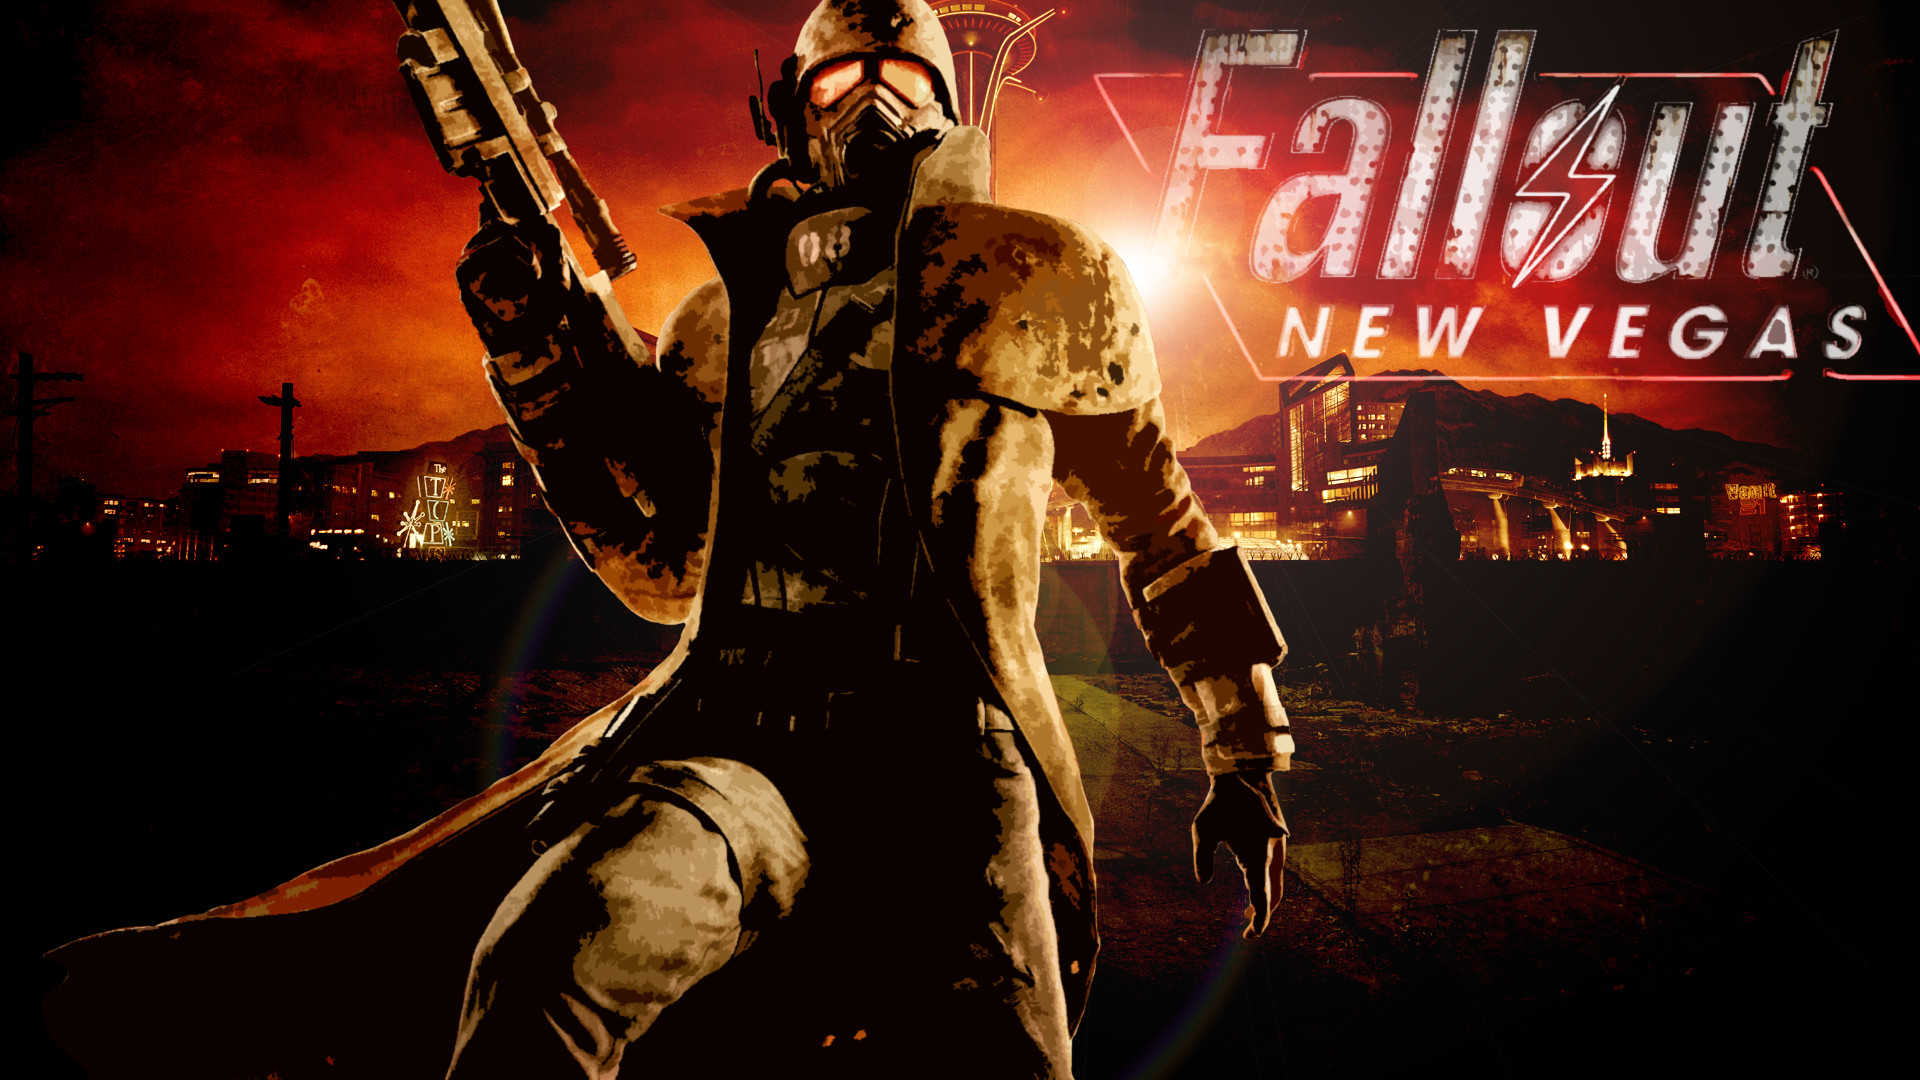 Fallout New Vegas Wallpaper (73+ Images